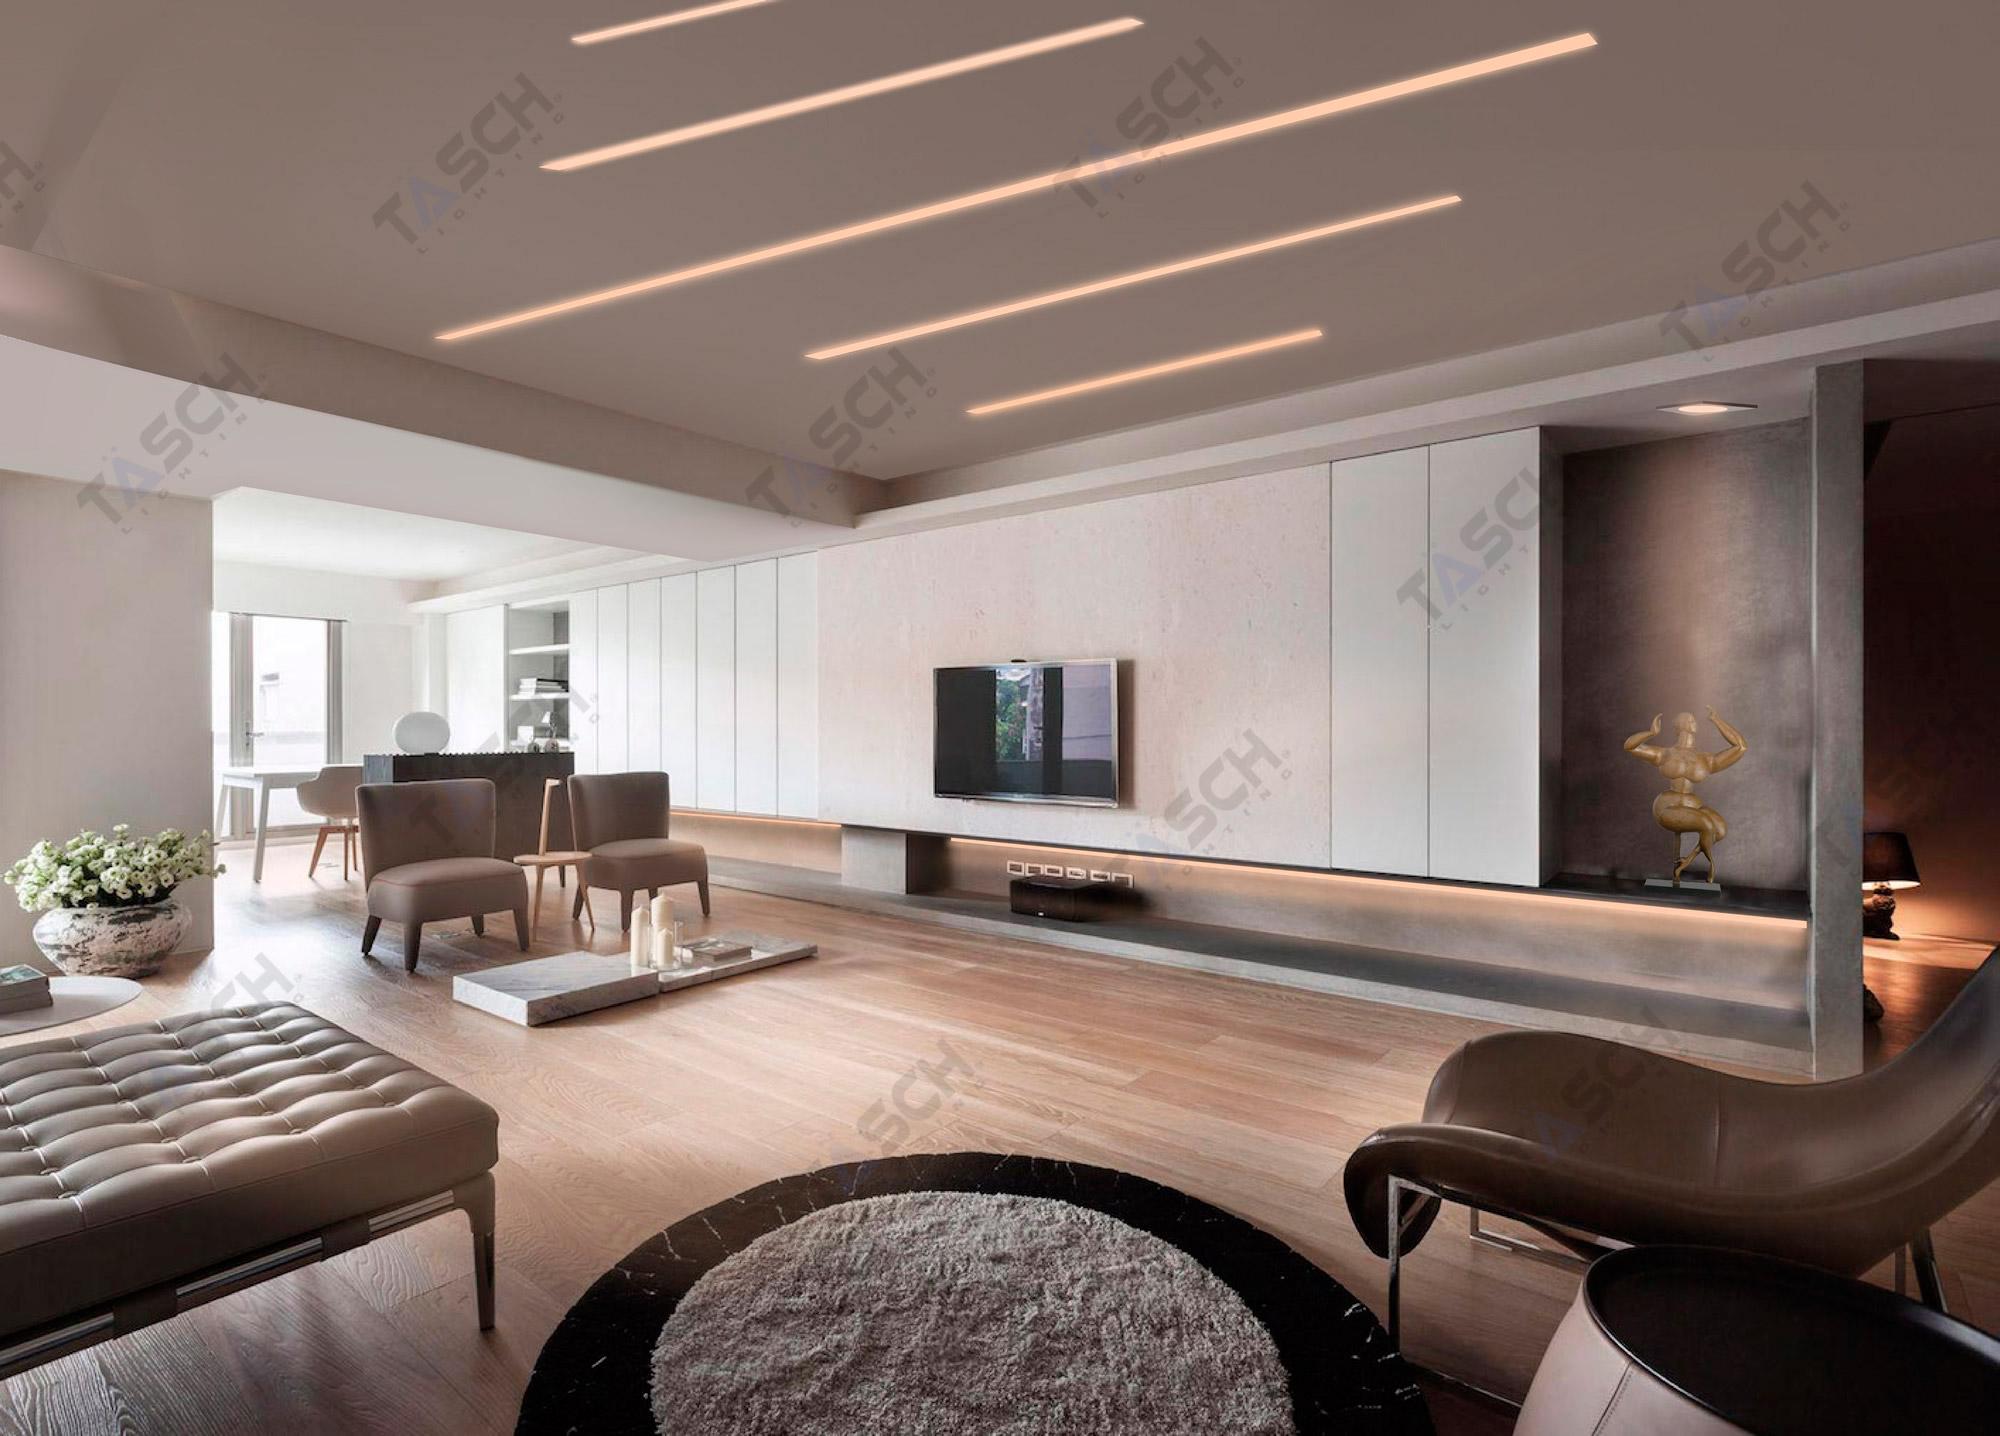 Super user click to enlarge image 1led lighting design linear lighting arubaitofo Gallery